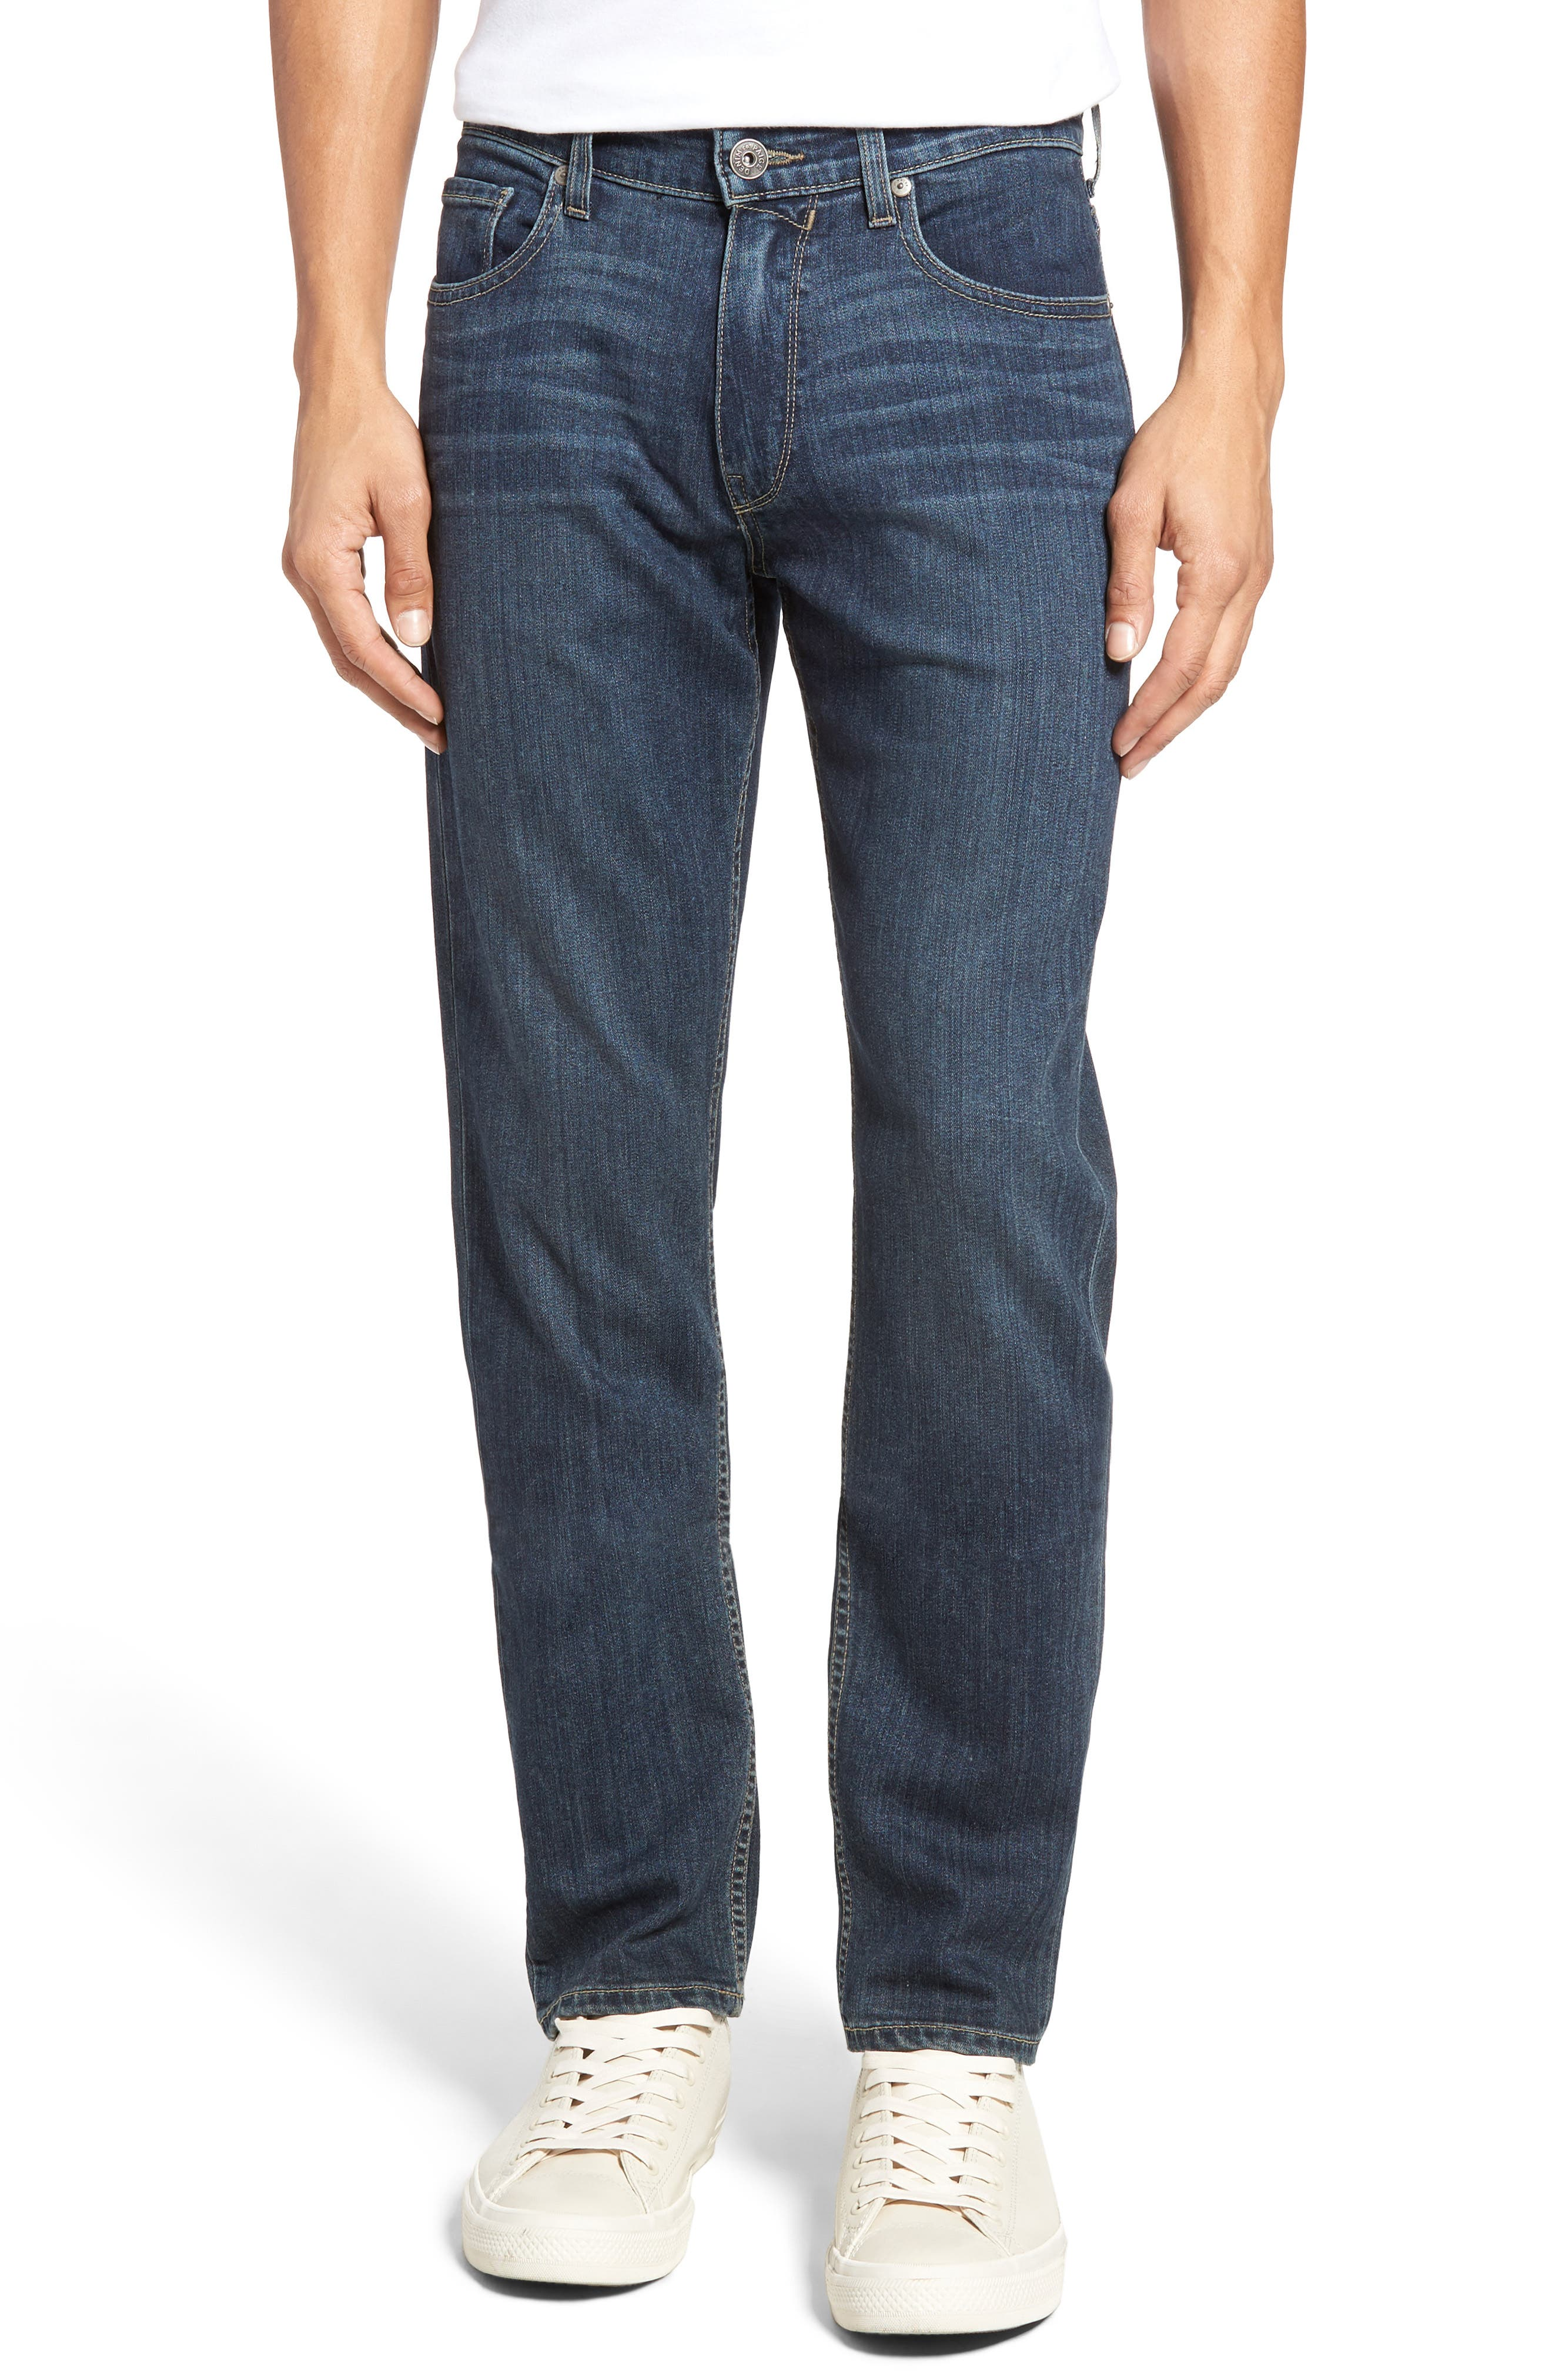 PAIGE Transcend - Federal Slim Straight Leg Jeans (Wayne)